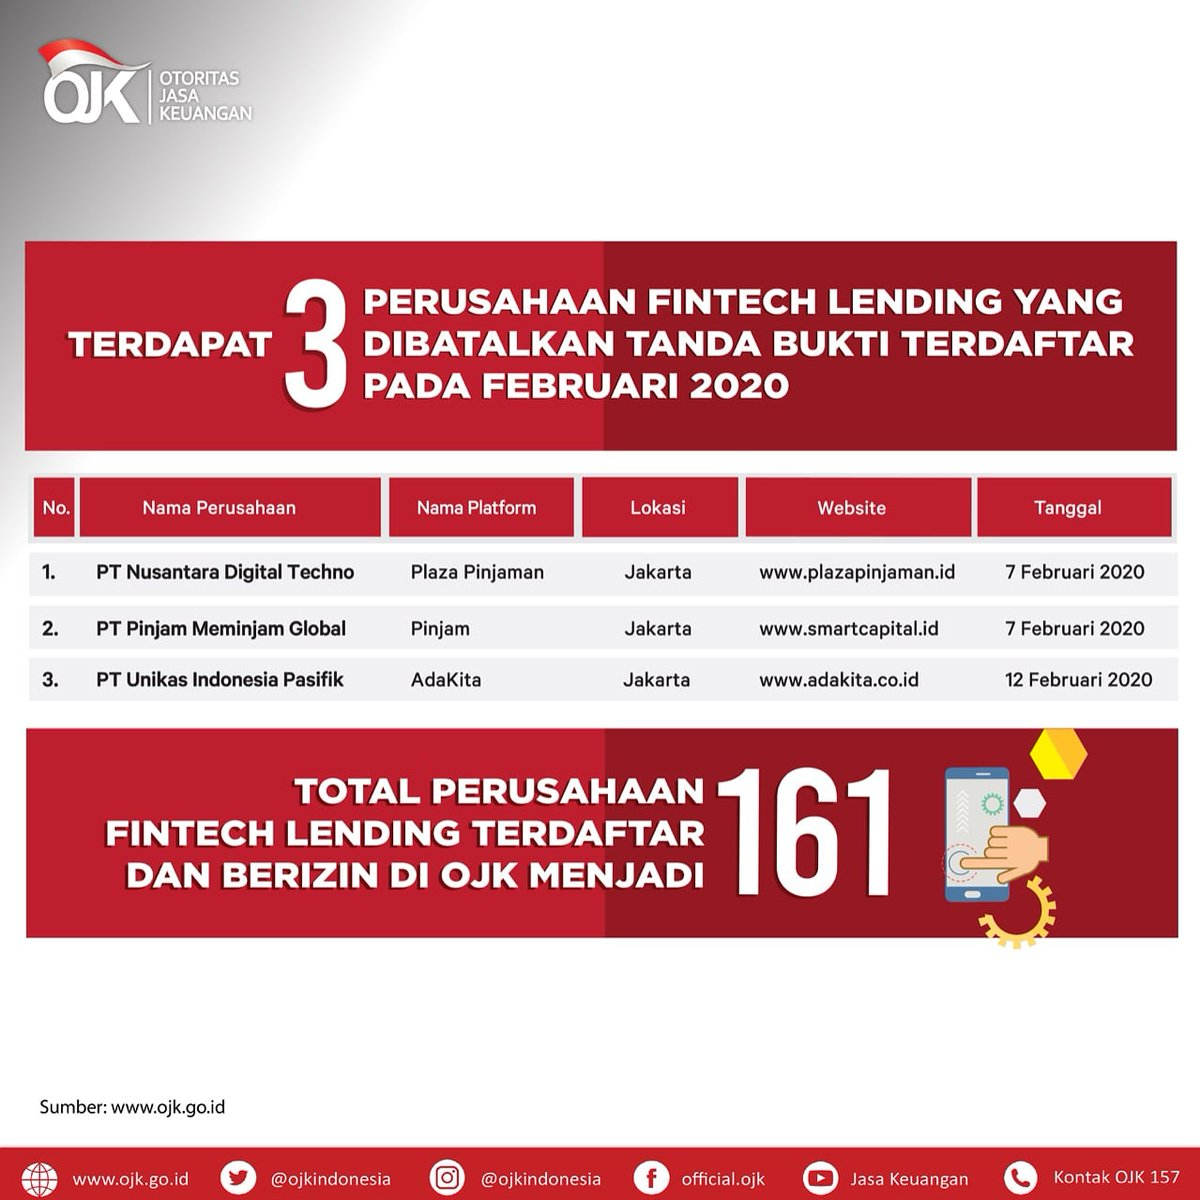 Ojk Indonesia On Twitter Sobat Ojk Pada Februari 2020 Terdapat Tiga Perusahaan Fintech Lending Yang Dibatalkan Tanda Bukti Terdaftar Hal Ini Dikarenakan Penyelenggara Yang Telah Mendapatkan Surat Tanda Bukti Terdaftar Tidak Menyampaikan